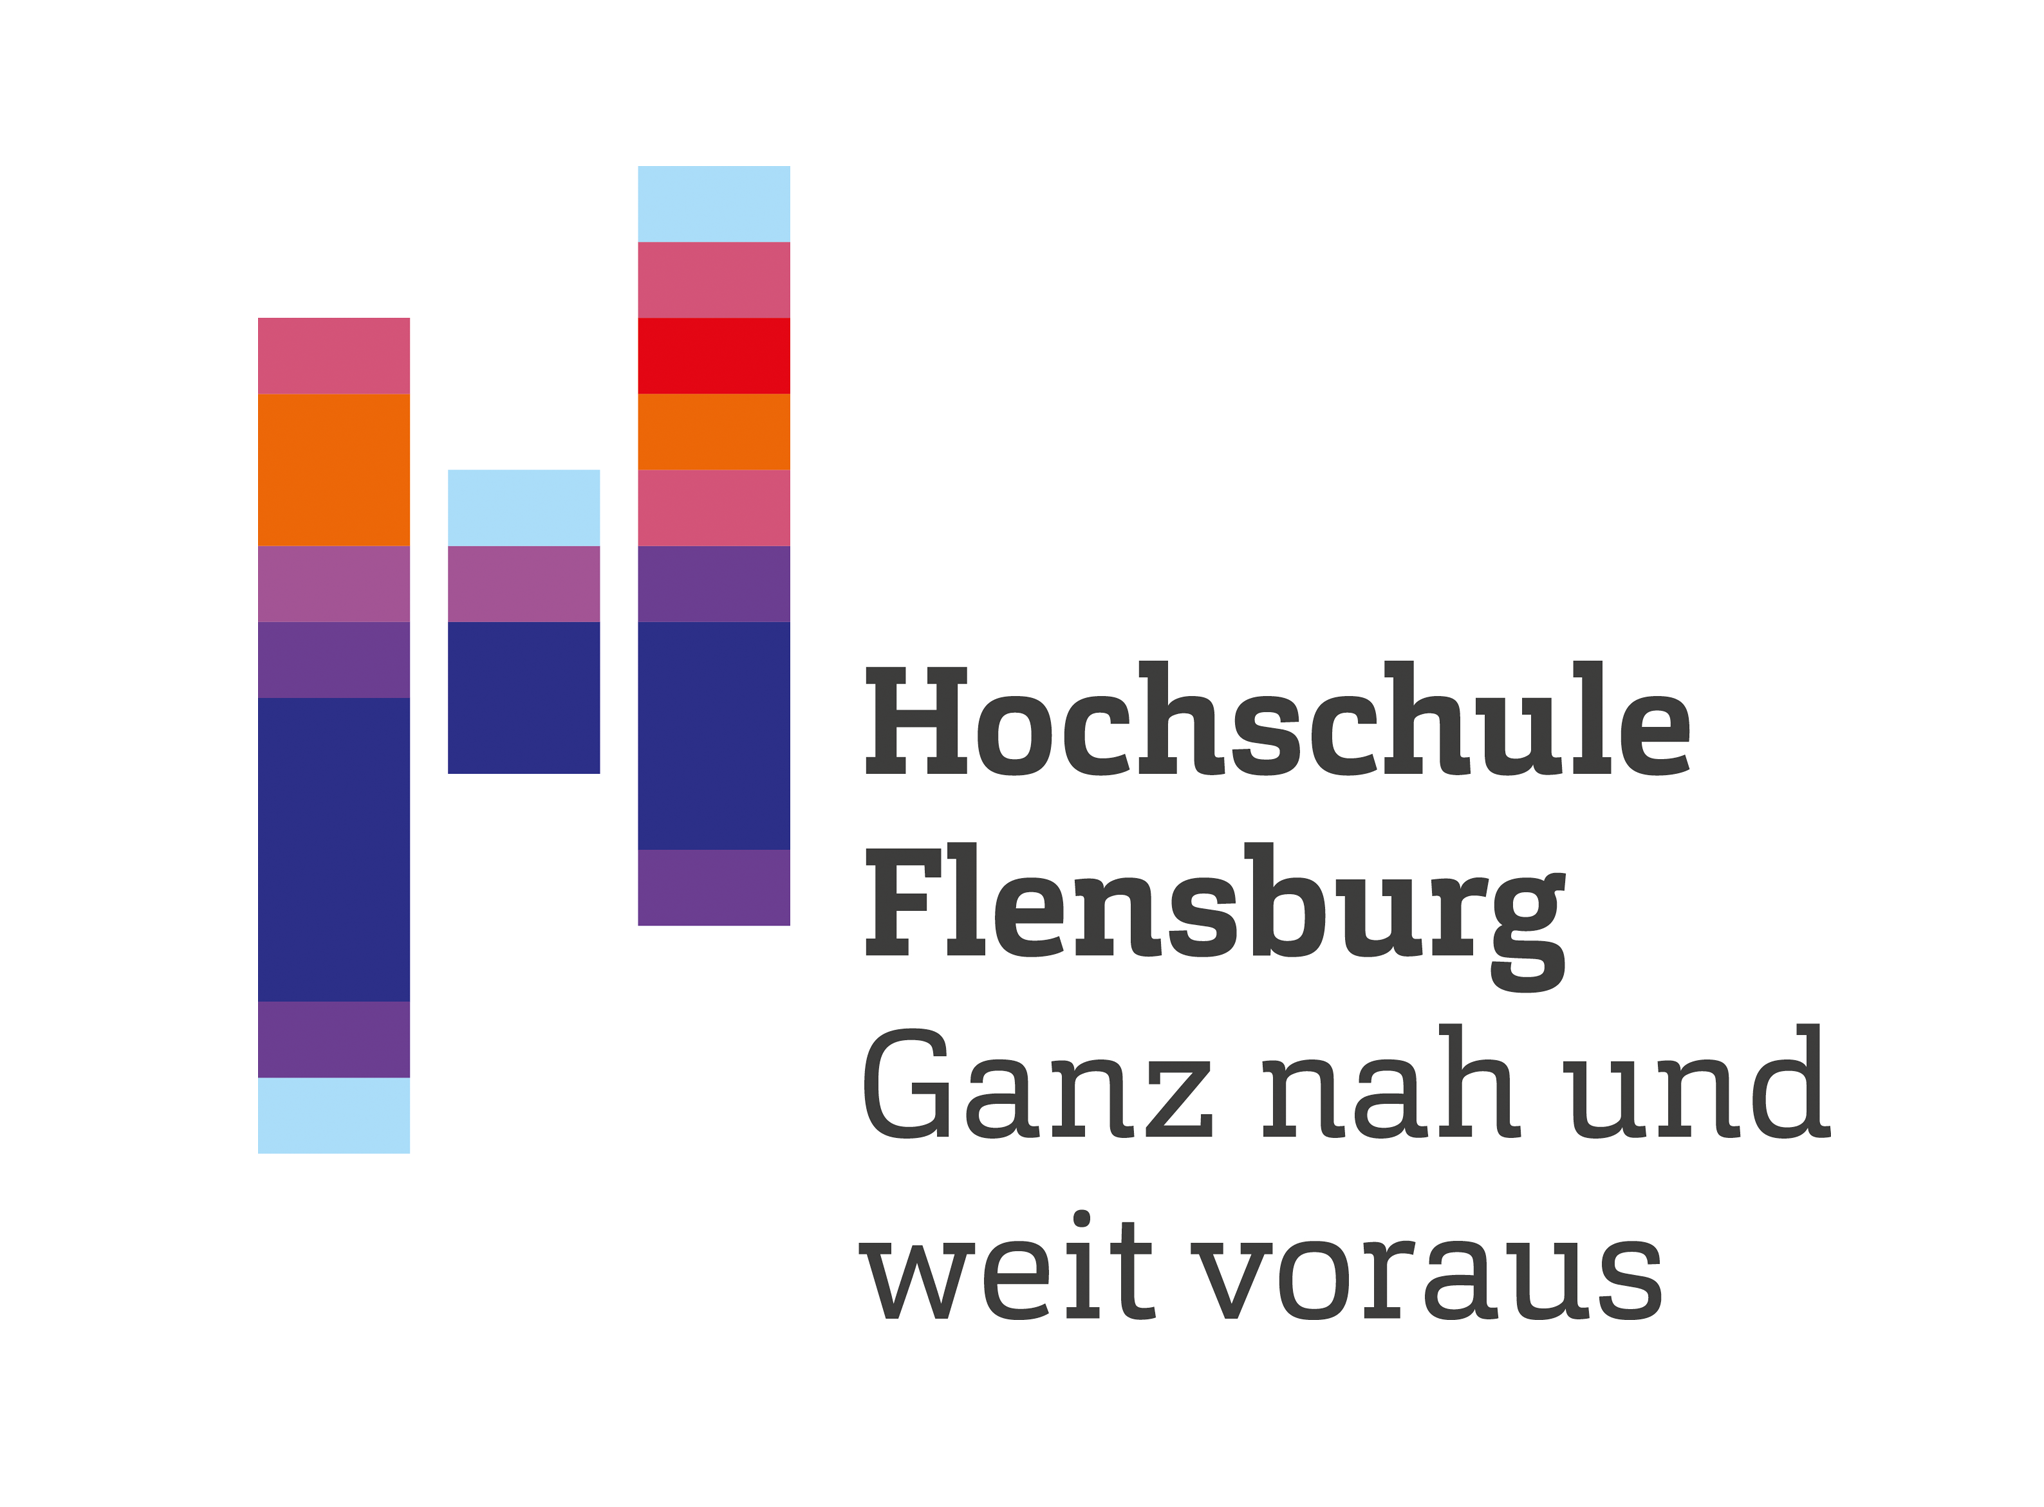 HS-Flensburg_1